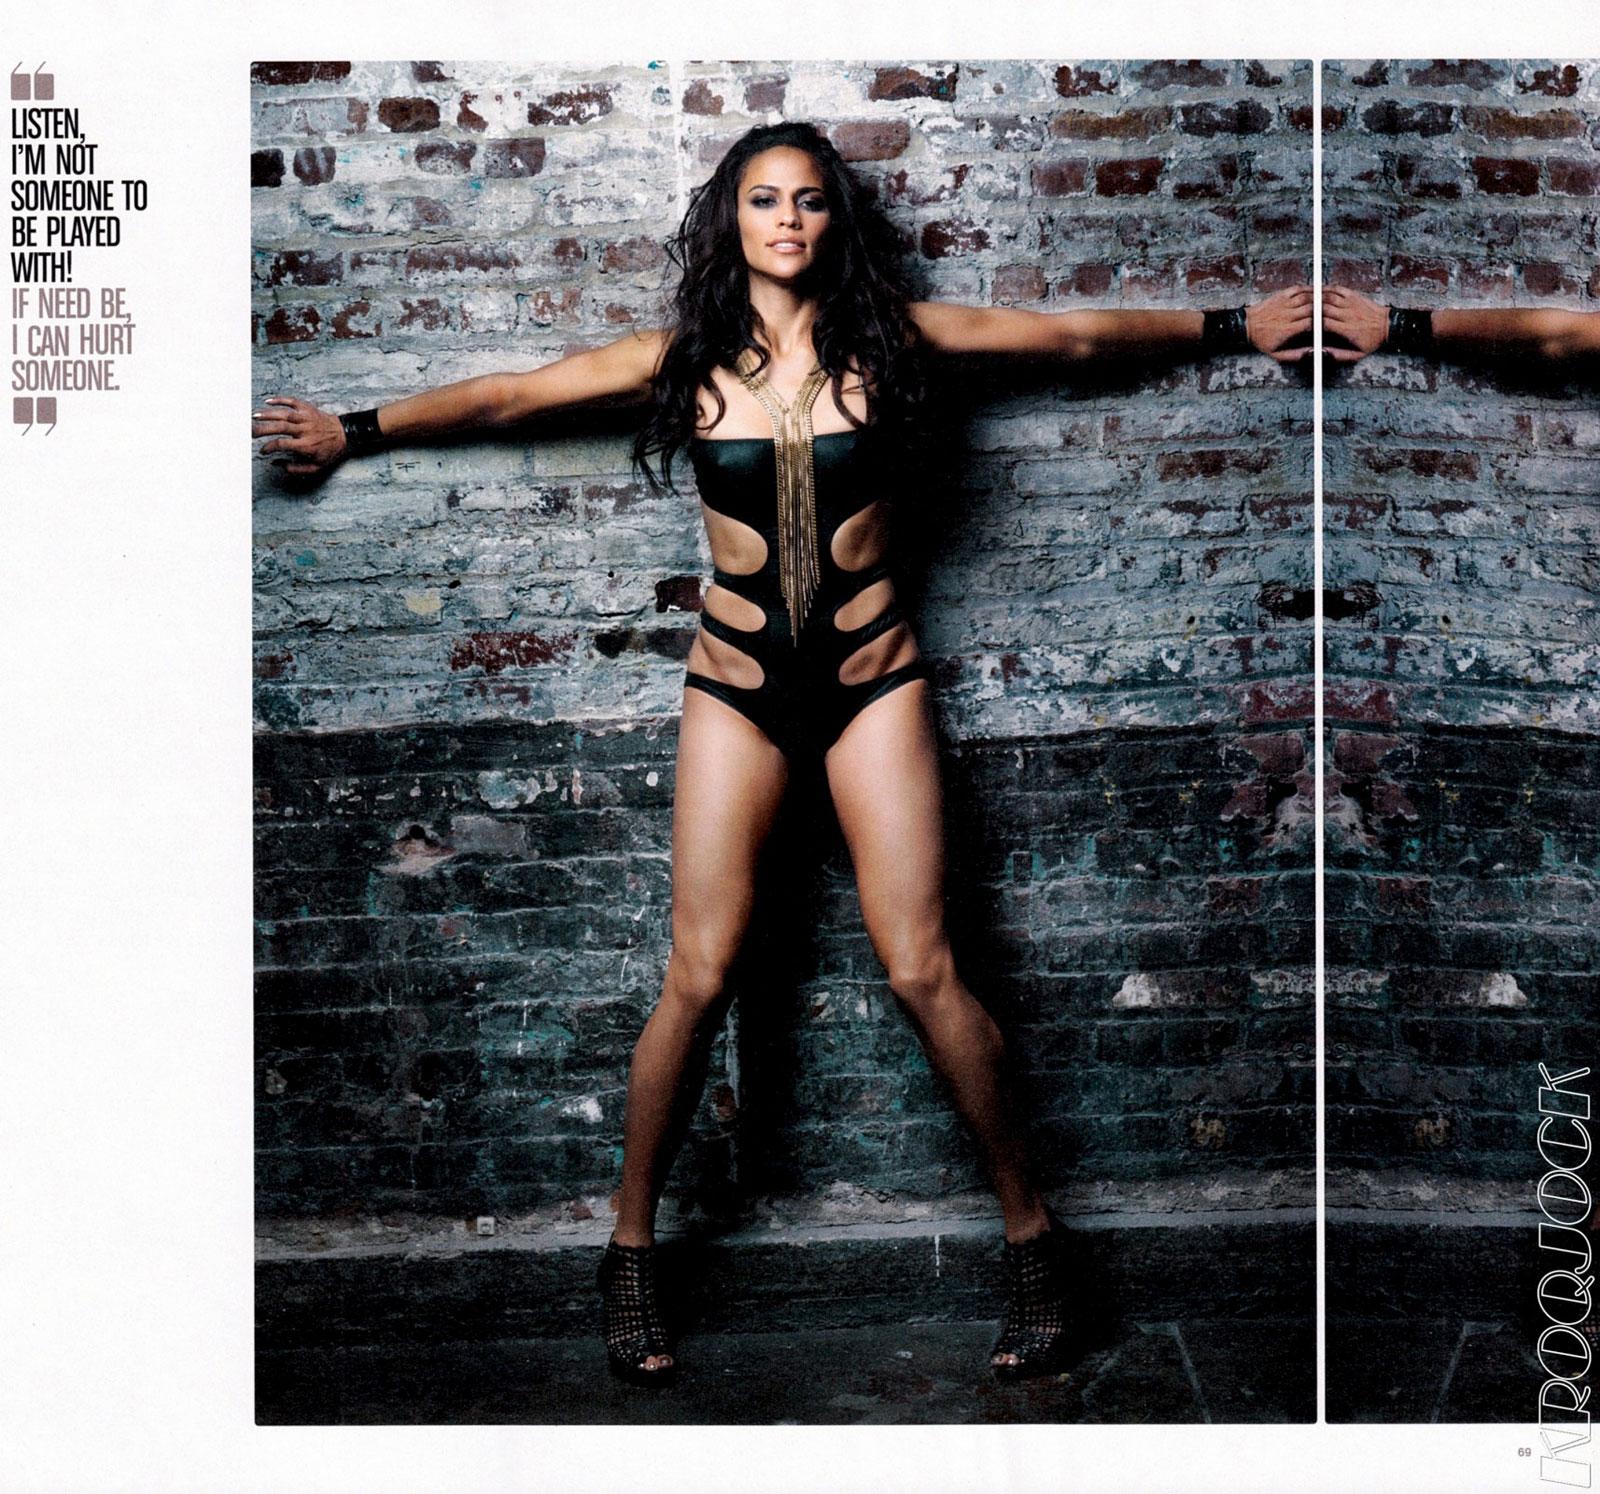 paula patton in complex magazine - hawtcelebs